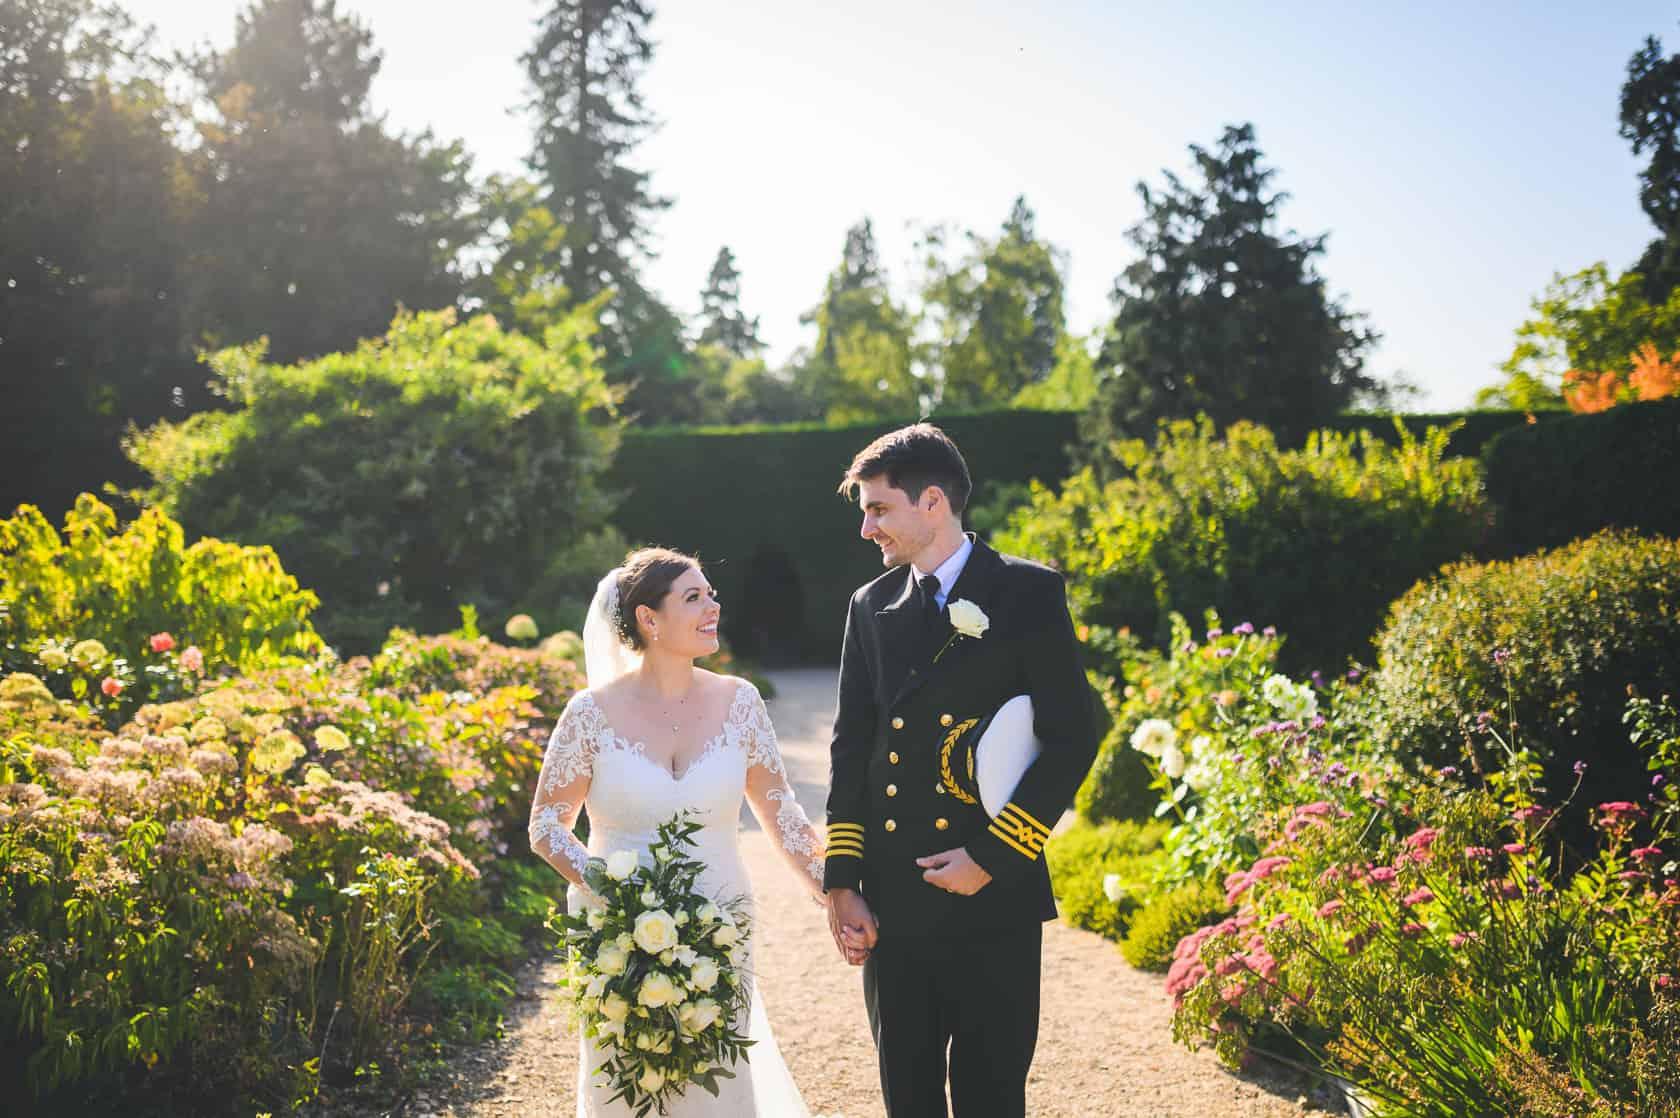 Best_Wedding_Photography_2019_Wedding-Photographer-Essex_057